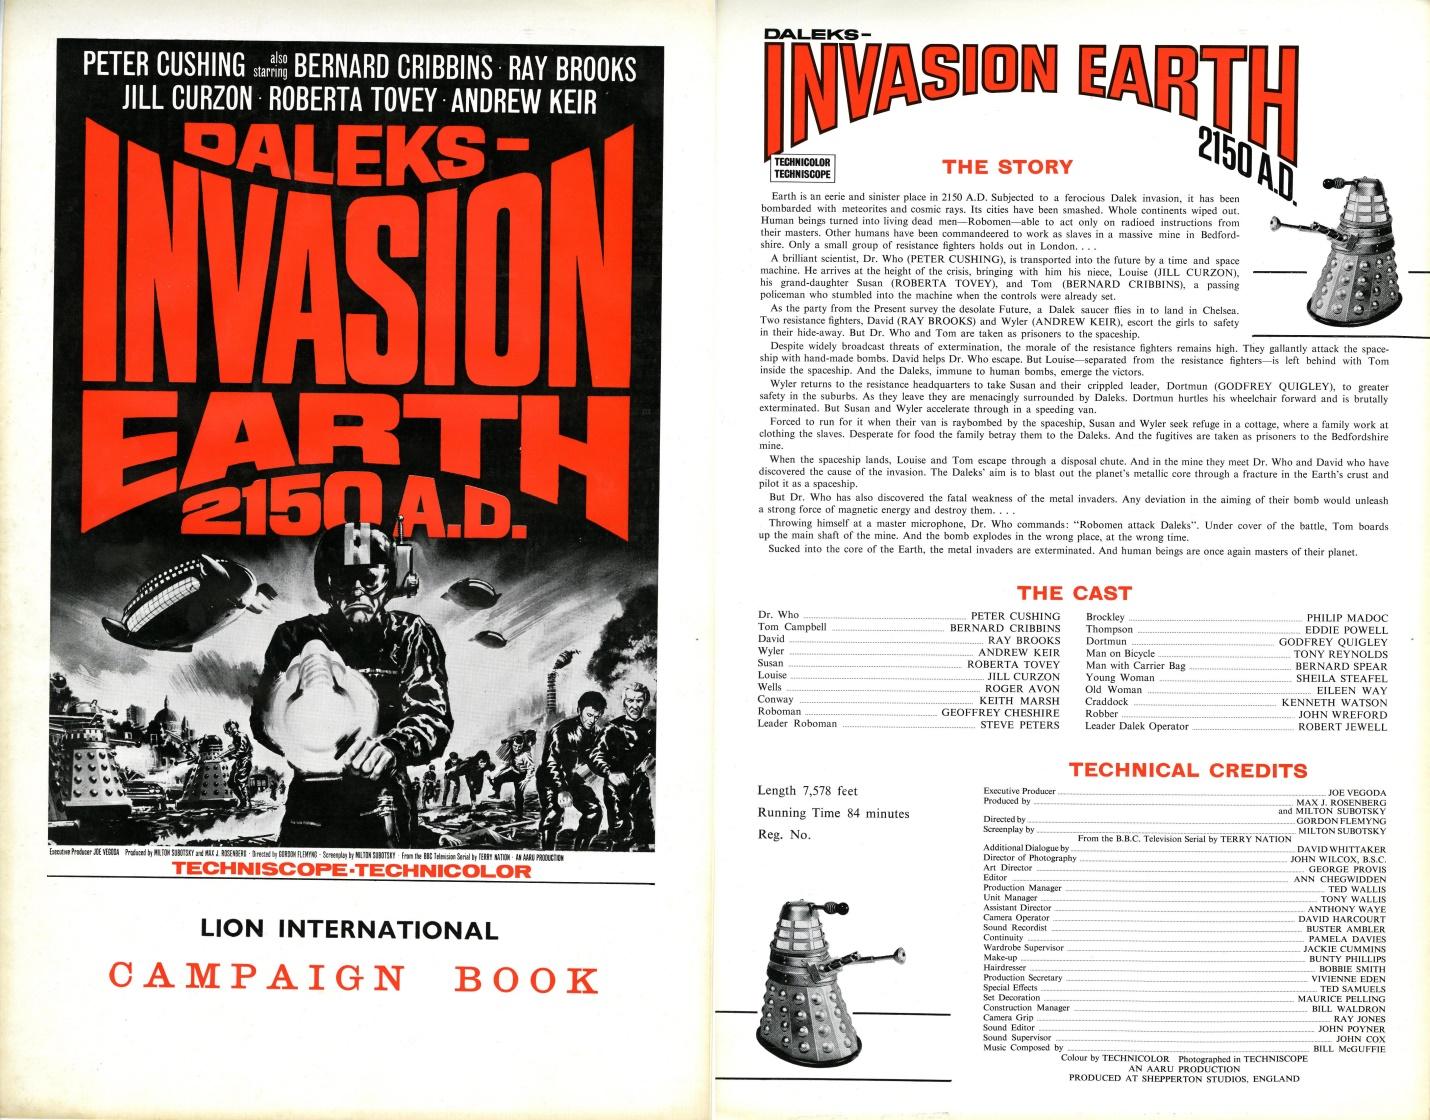 Lion International Campaign Book